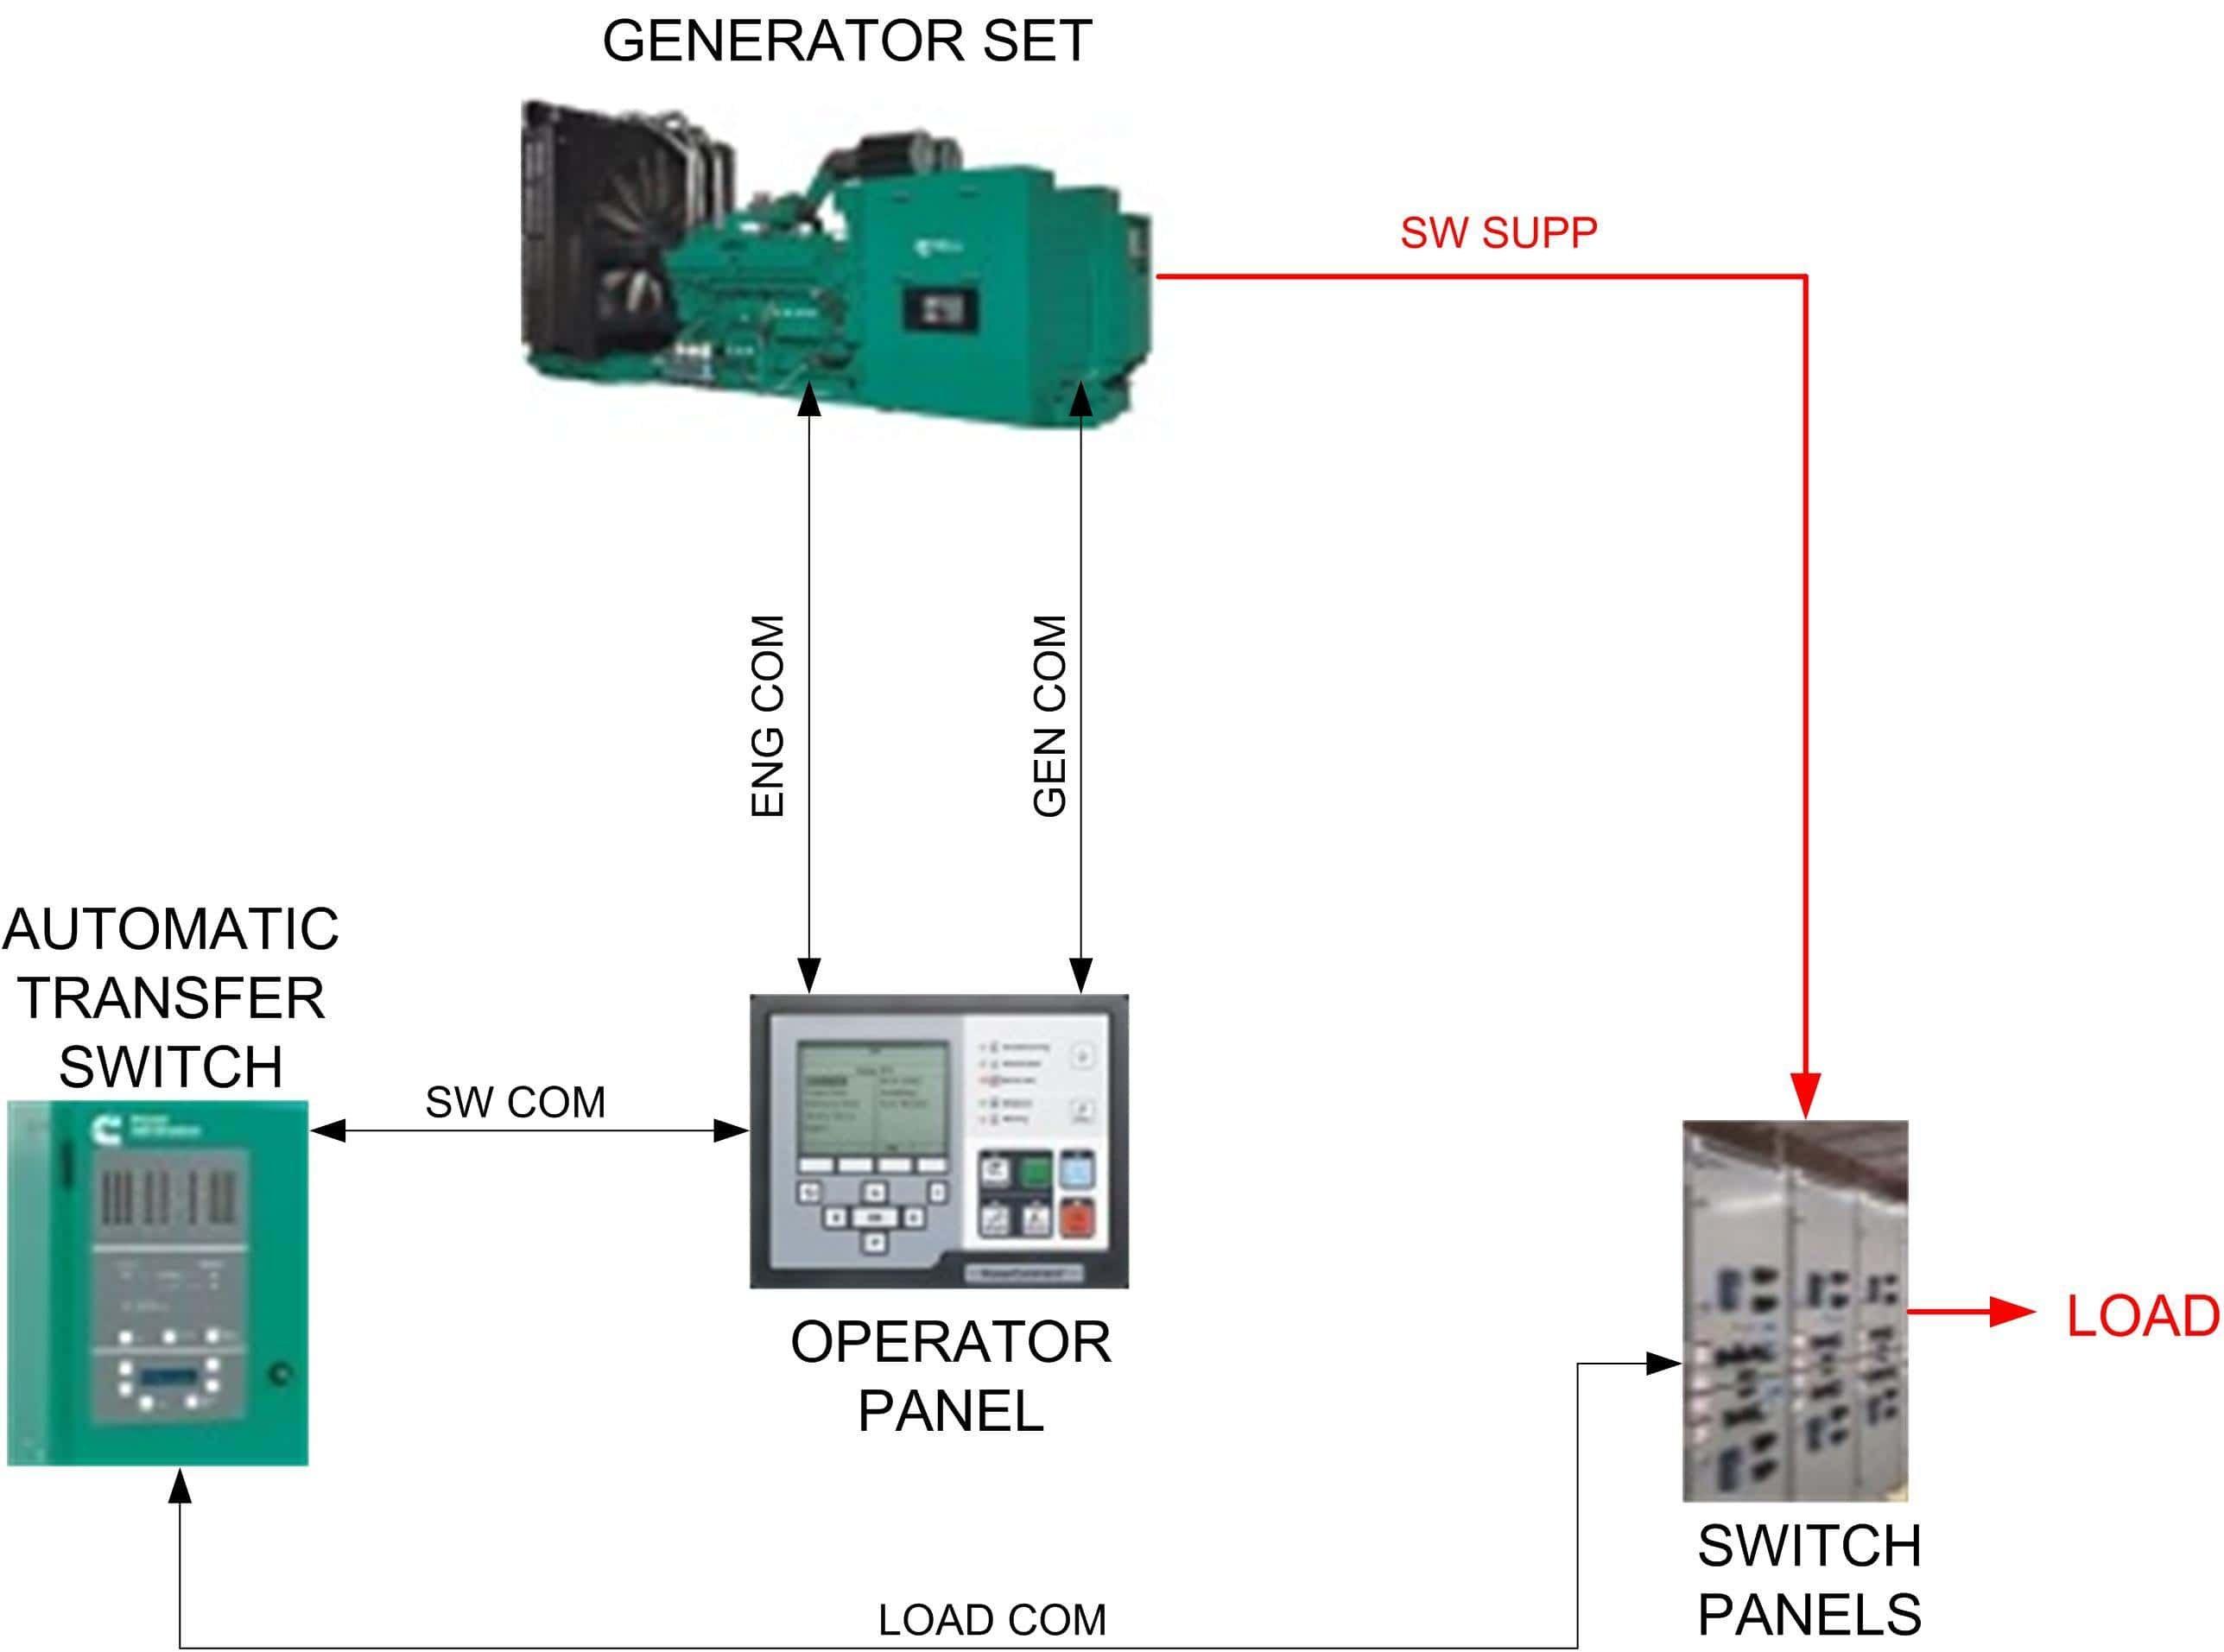 Generac Wiring Rewire Diagram And Ebooks Gp7500e Katolight Generator 34 Bridge Rectifier